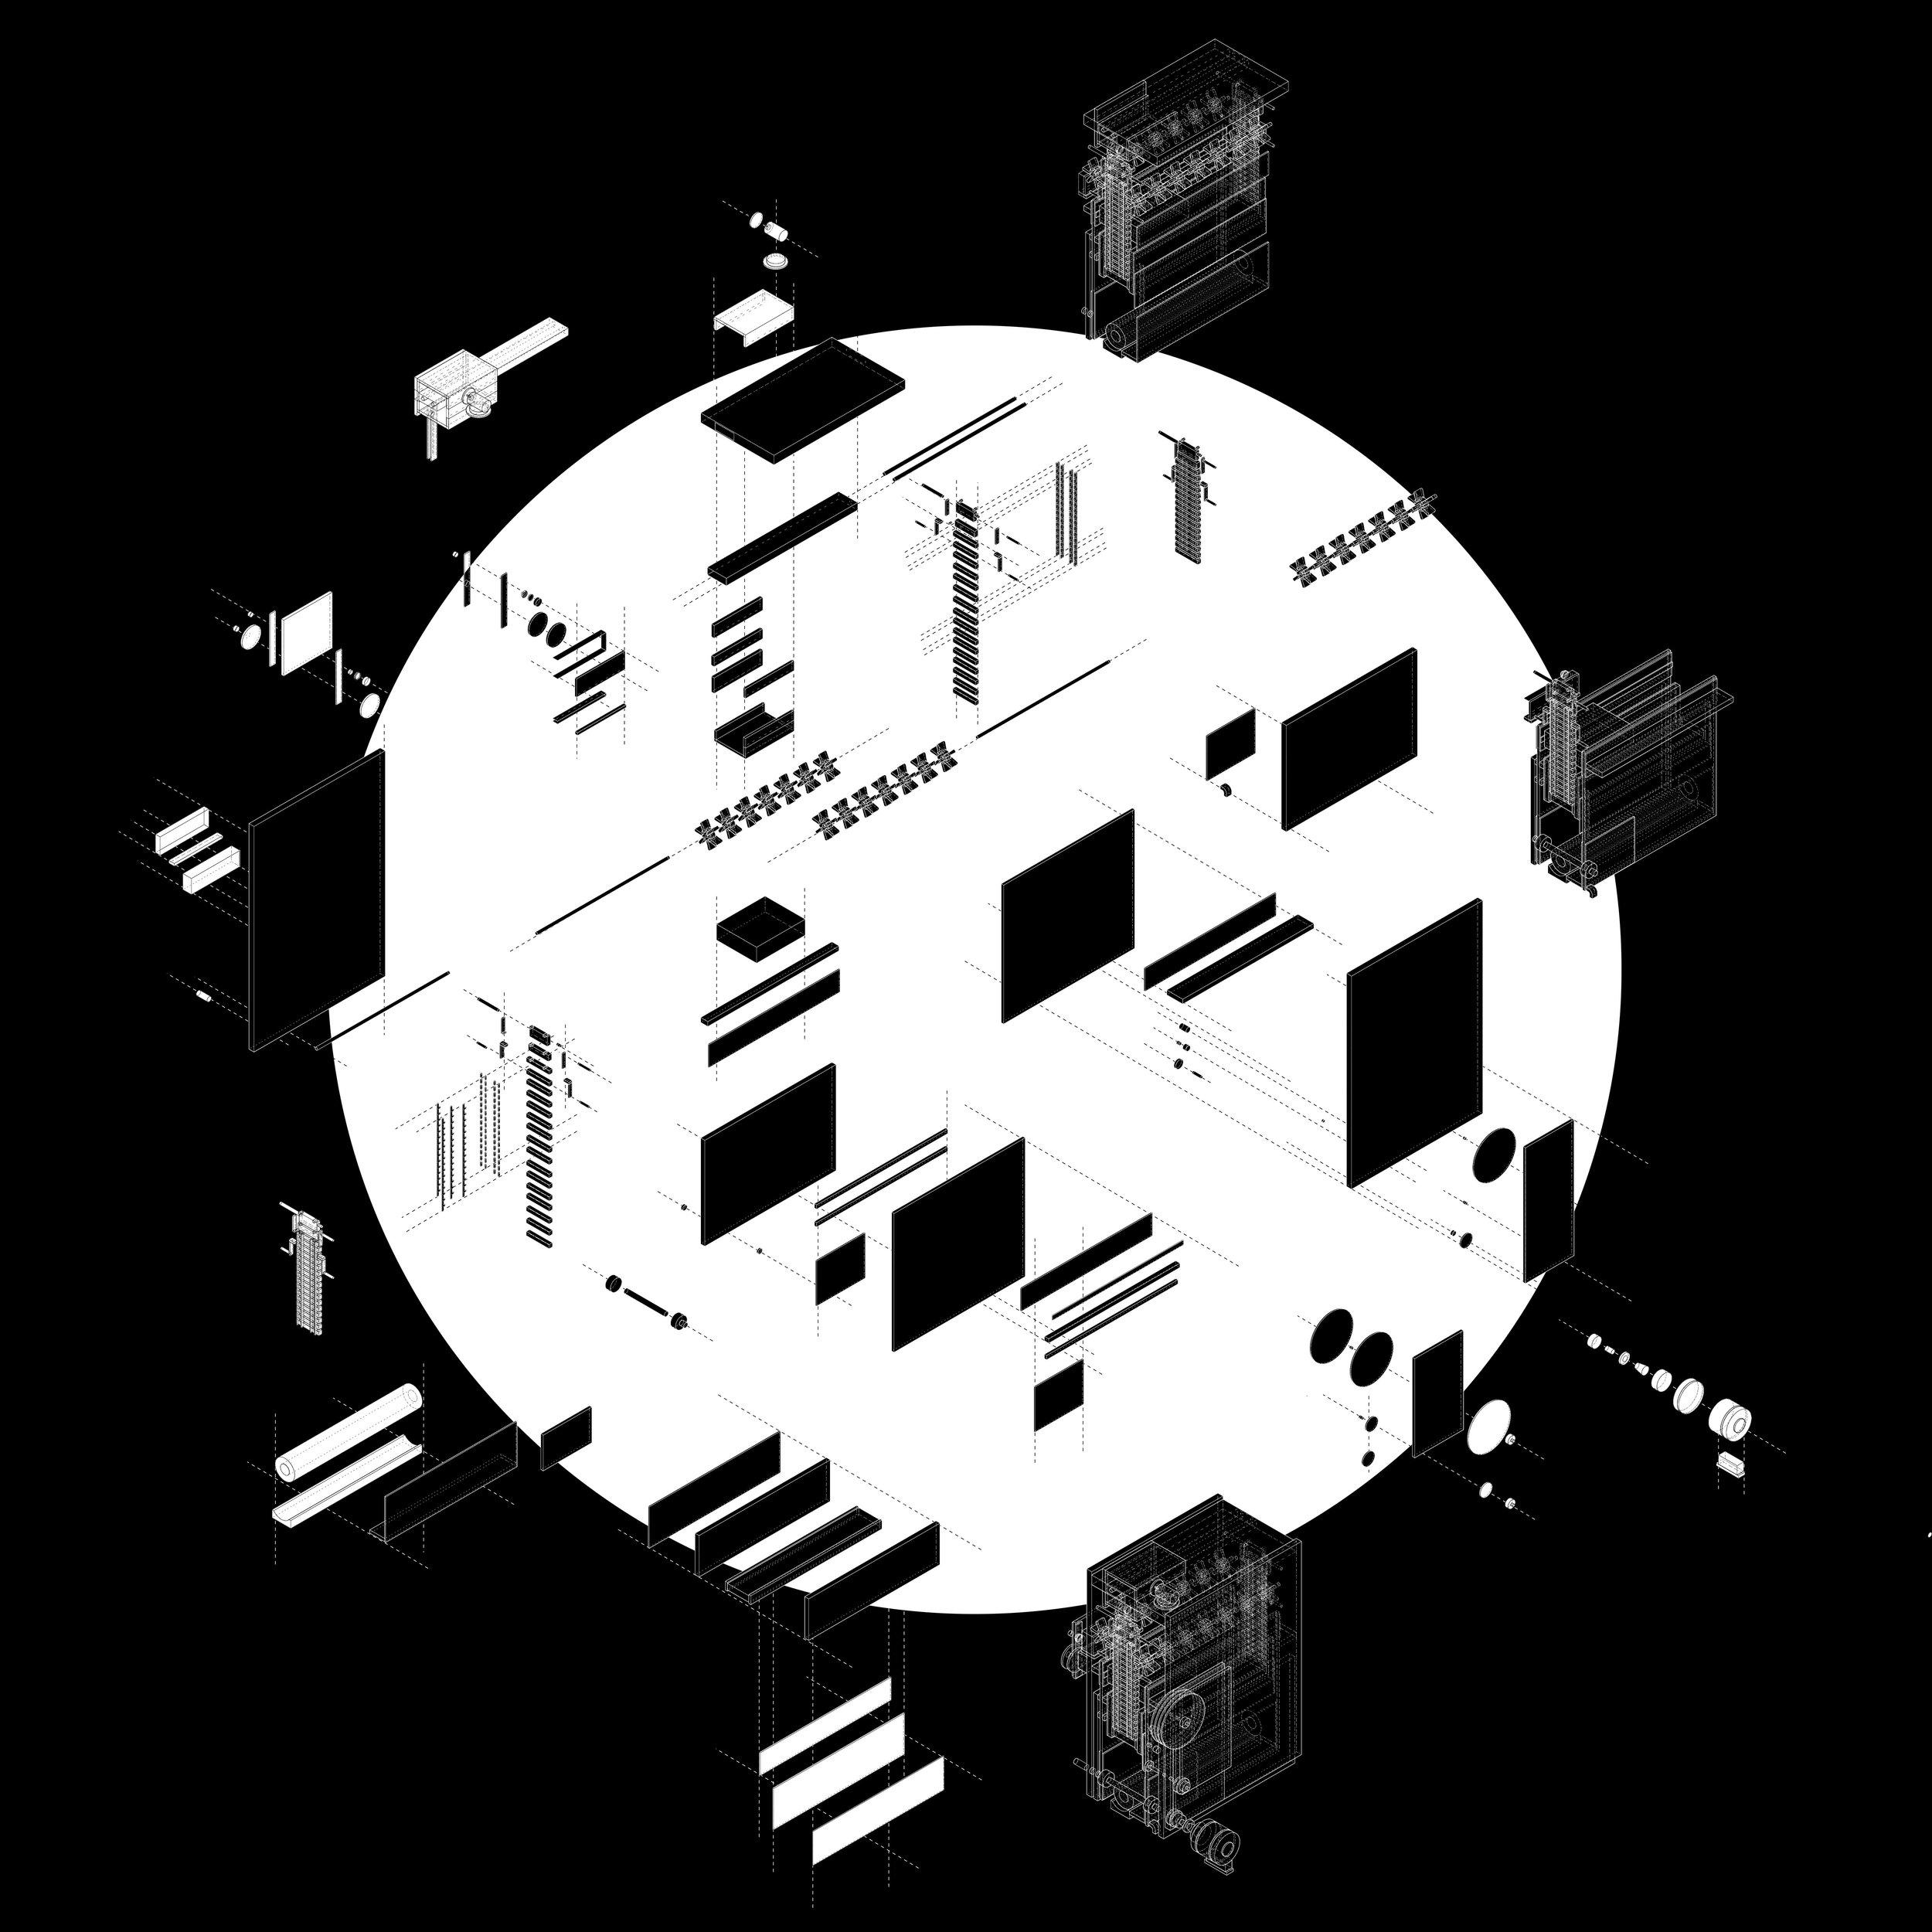 10_Exploded Axonmetric Parts 2.jpg